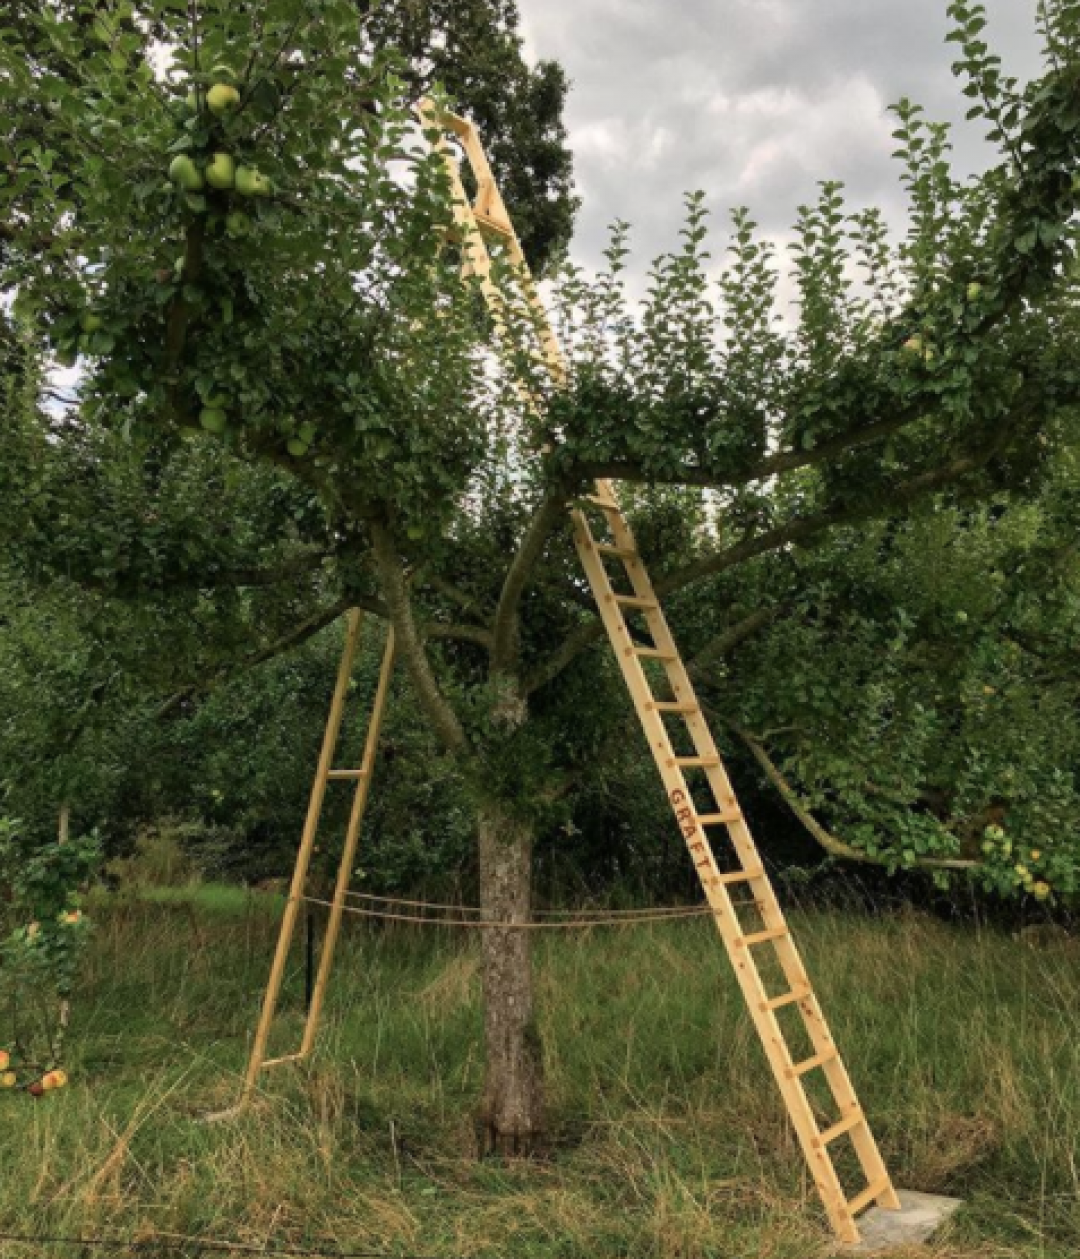 Graft Ladder Jo Lathwood Open Up Hestercombe photo by Tim Martin